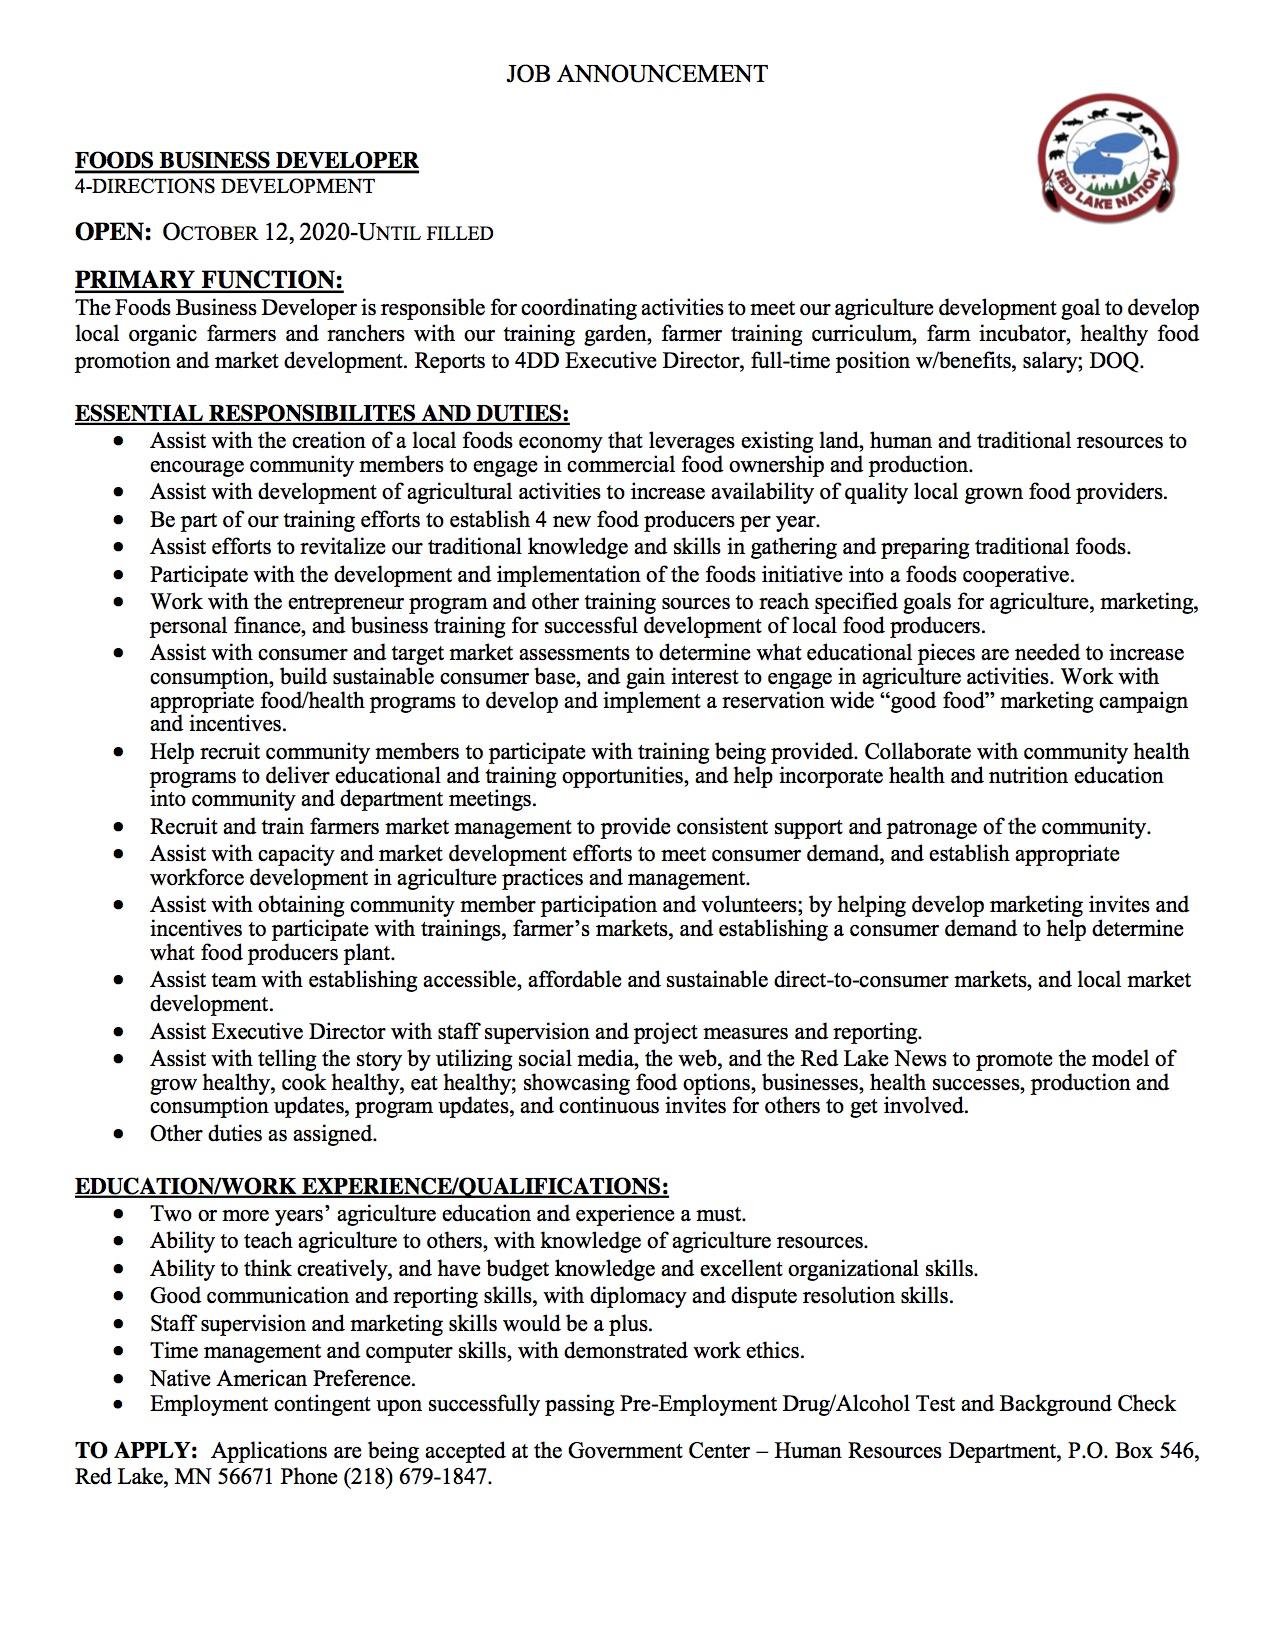 Foods Business Developer-4 DirectionsDevelopment-Job Posting-10-12-2020